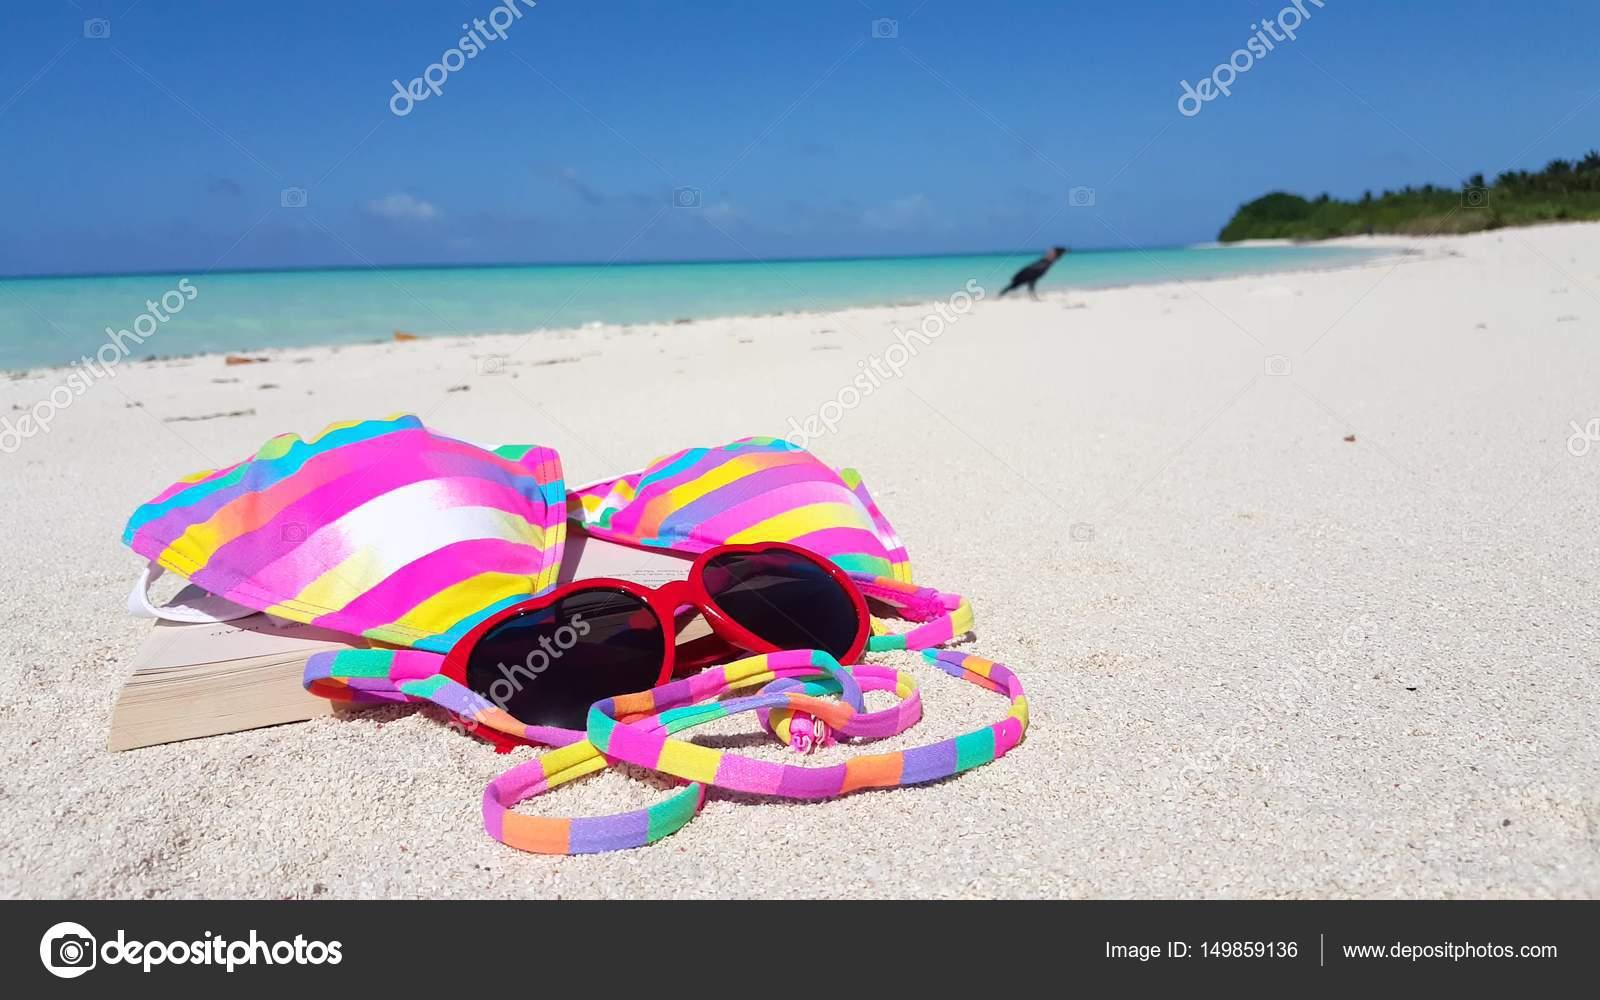 Playa Arena BikiniV00003 FondoIsla Maldivas Fondo Blanco E2H9IDYW